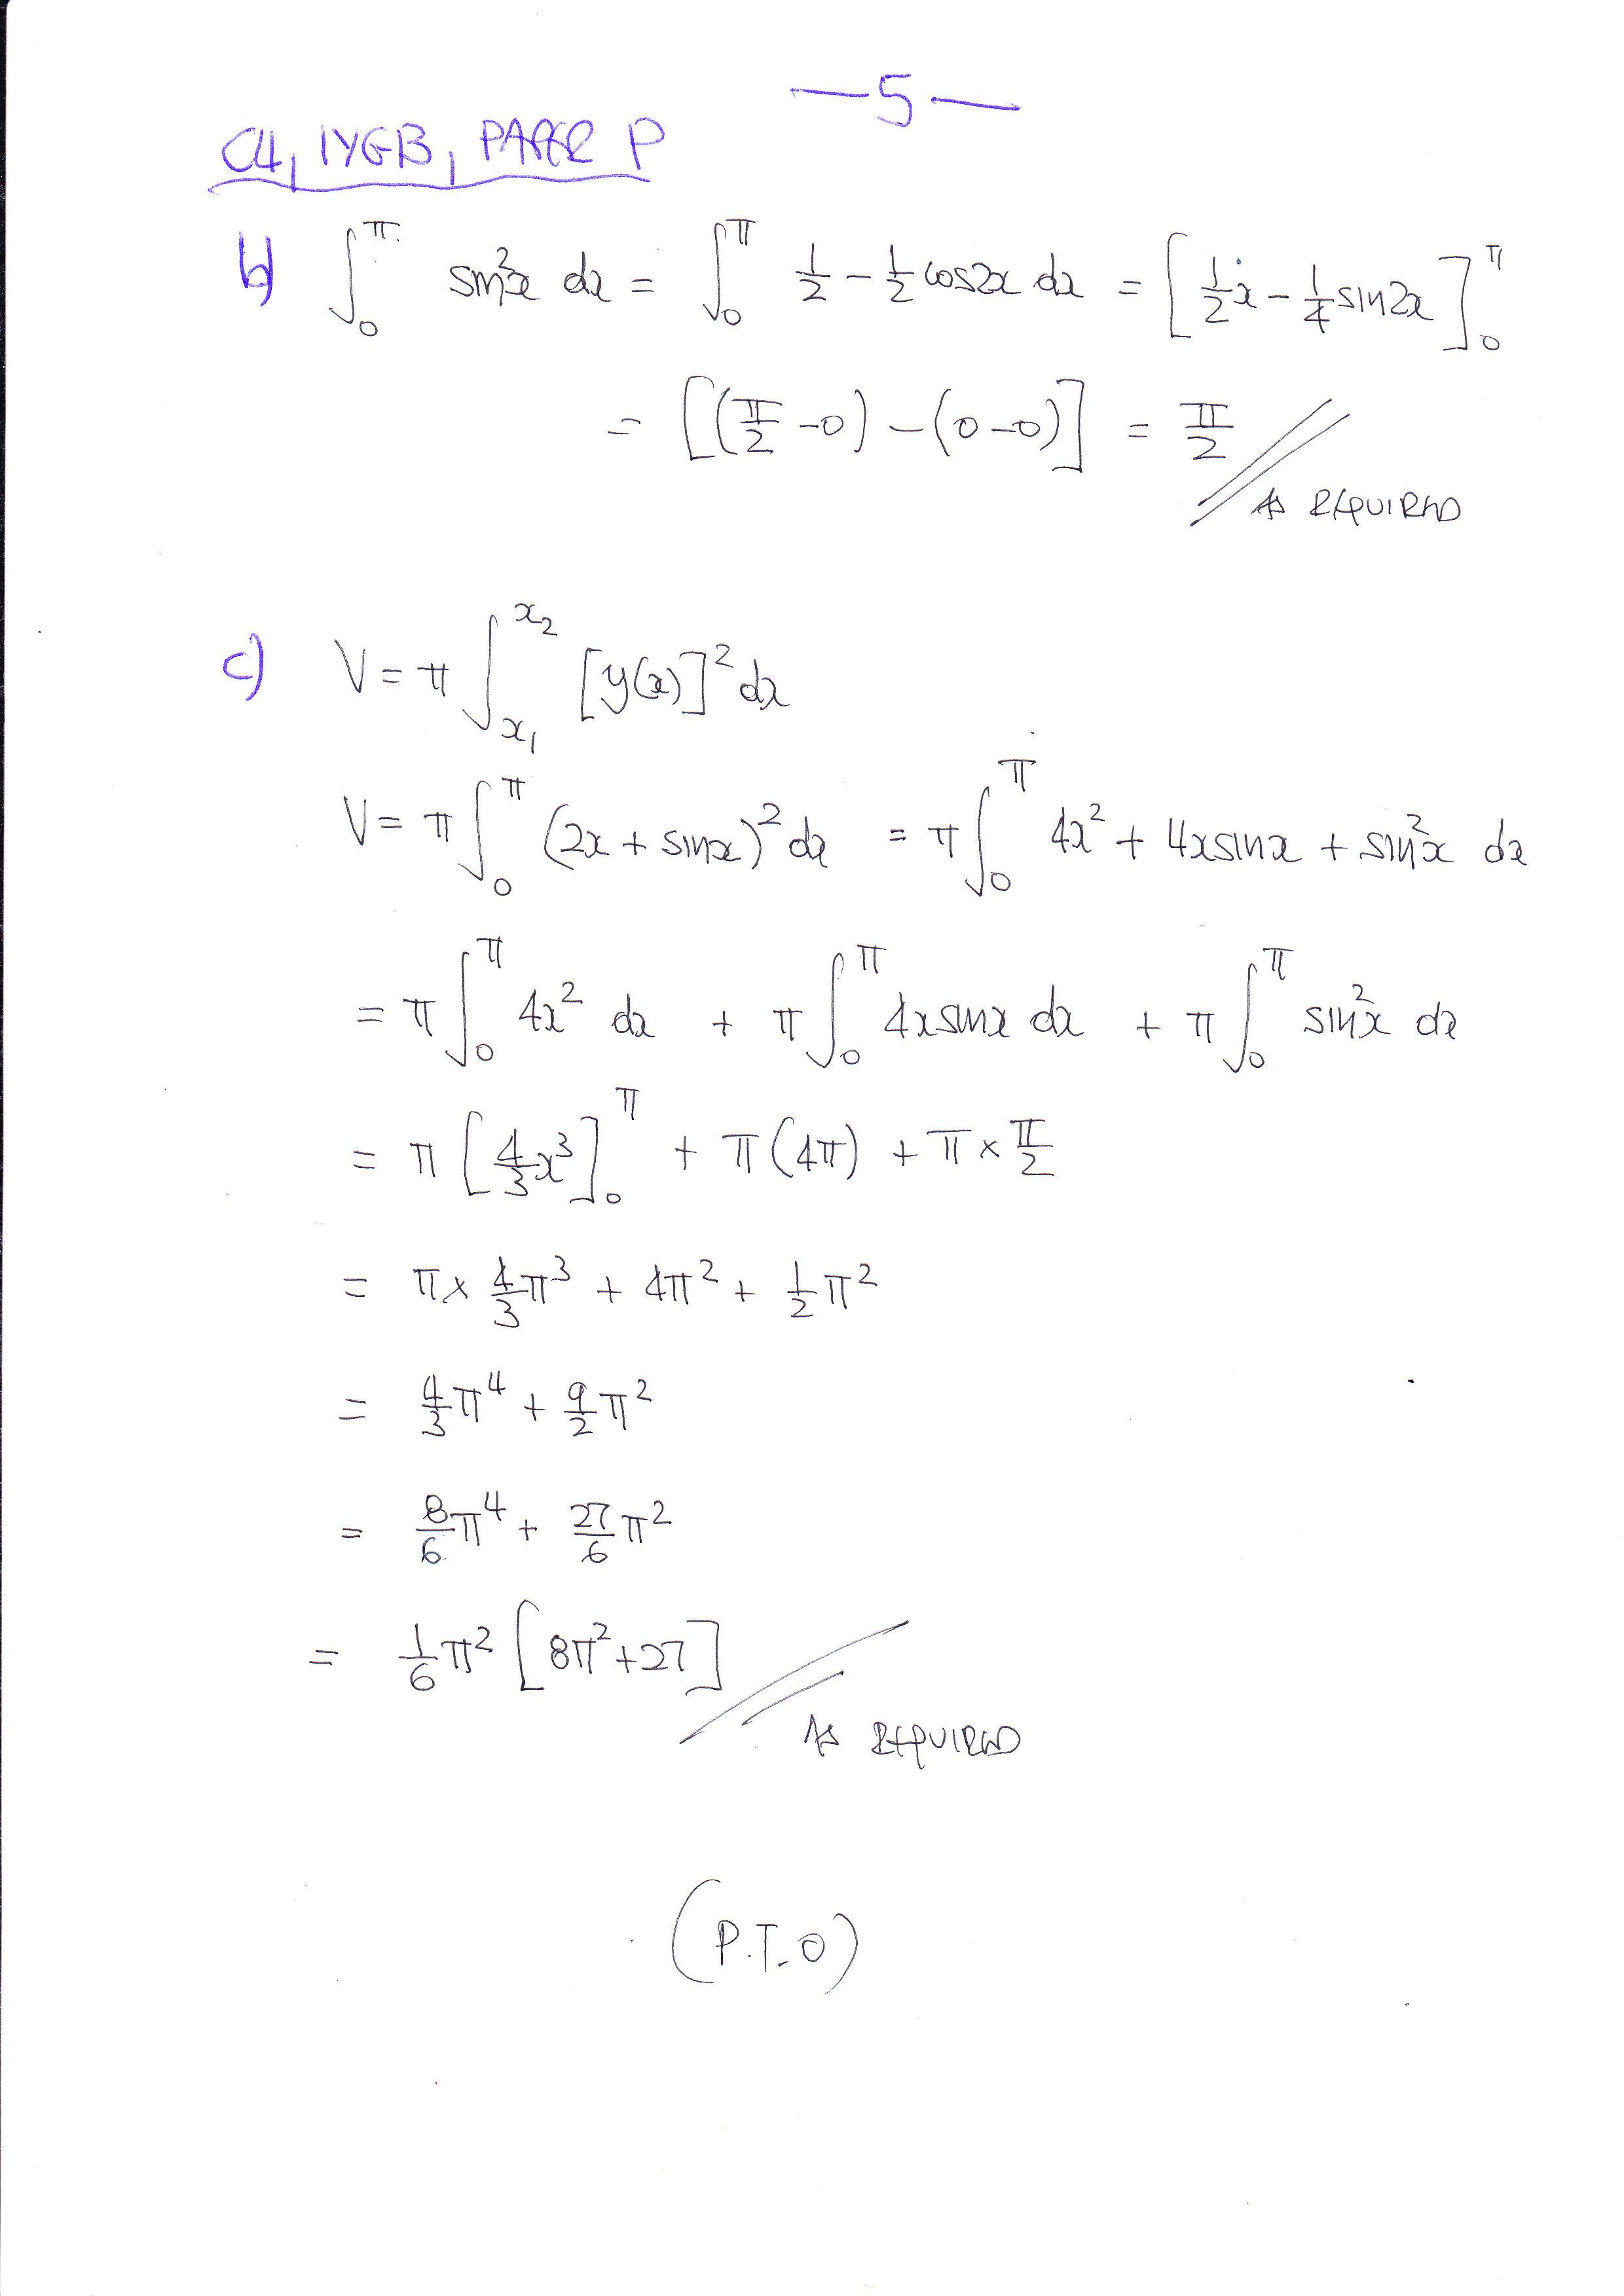 Name:  C4, IYGB, Paper P, page 5.jpg Views: 85 Size:  465.7 KB